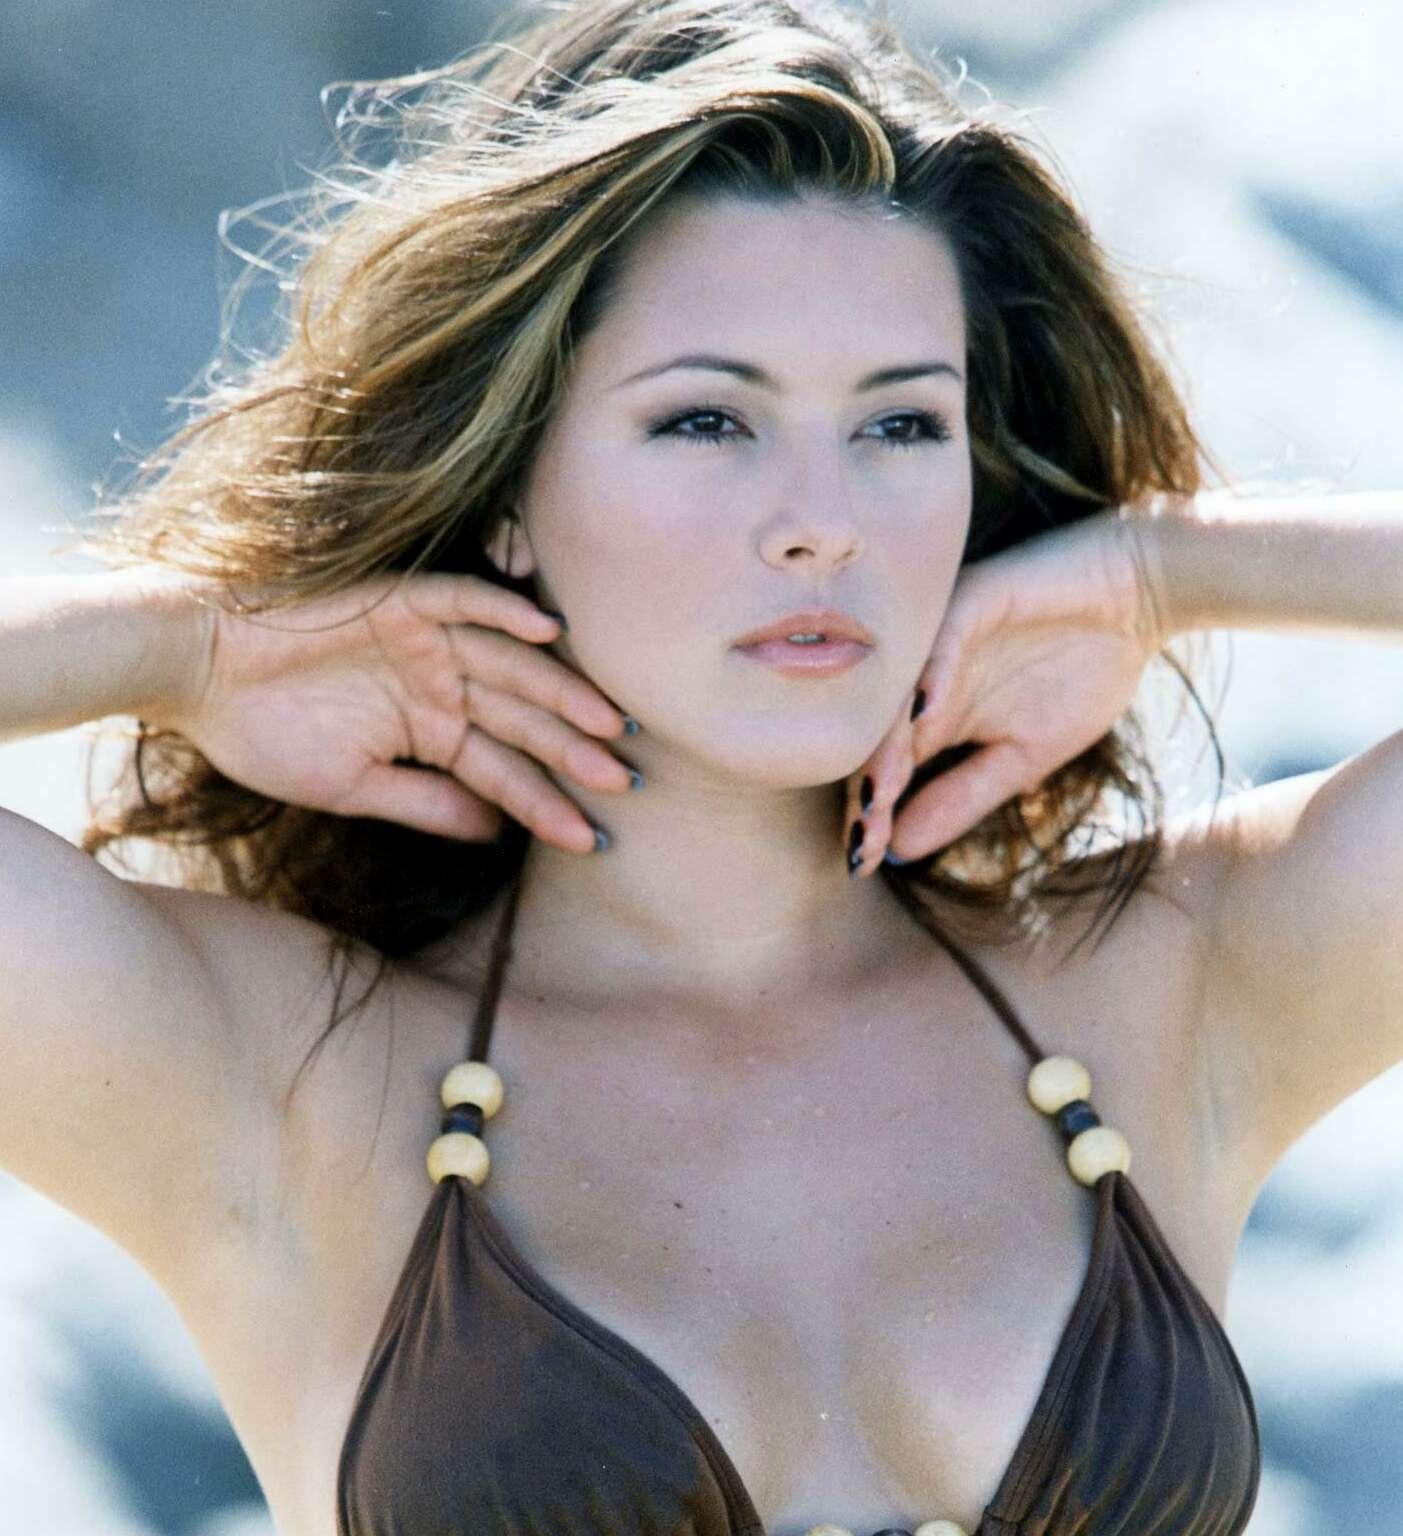 alice-machado-bikini-wifey-handjob-world